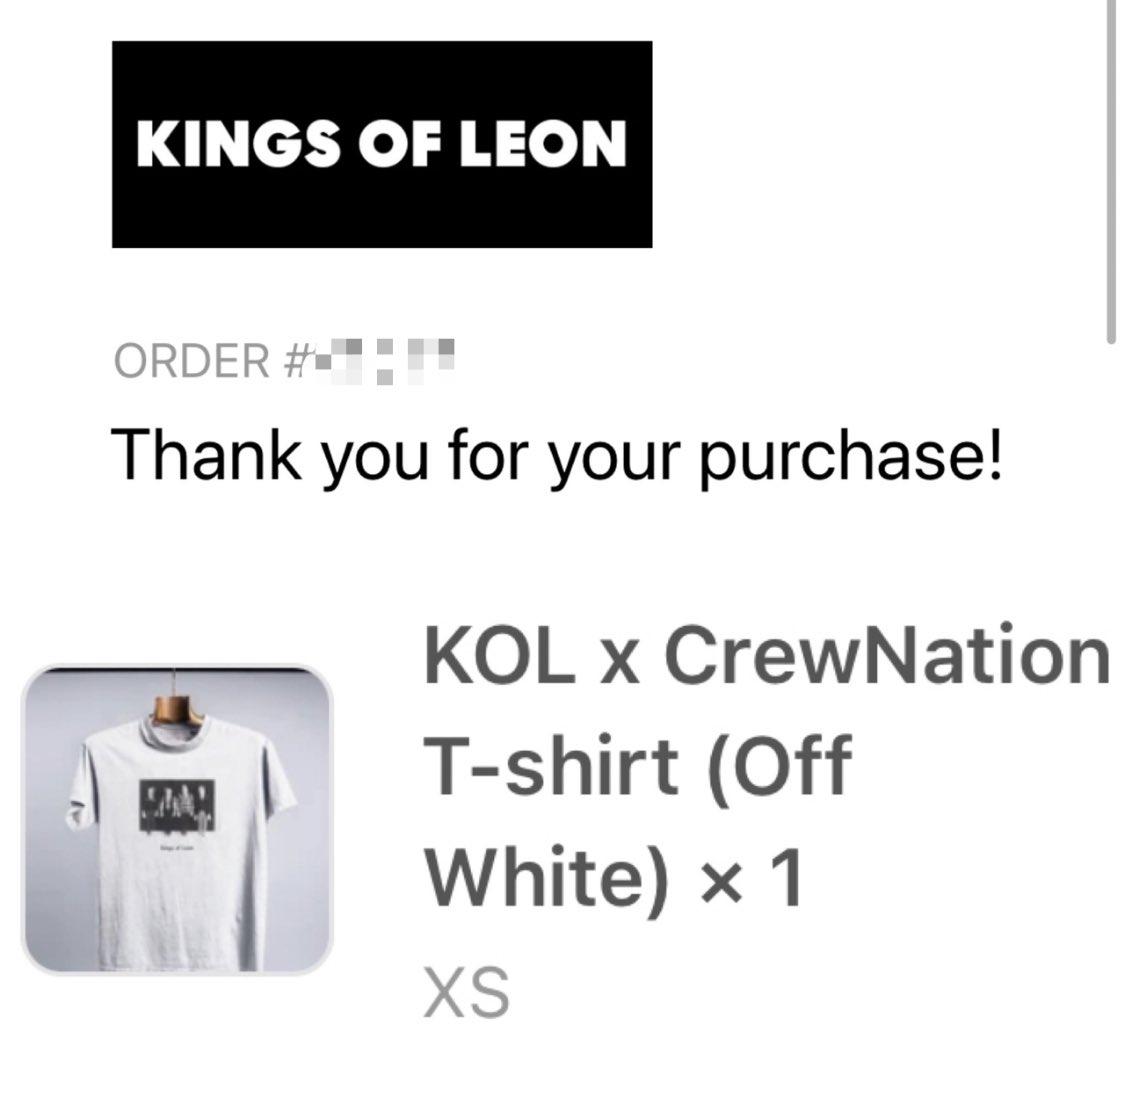 Wish me luck☘️I wanna help🙌🏼💪🏼#Crewnation and also catch 😎#TheBandit @KingsOfLeon @barkingironsny #KOL8